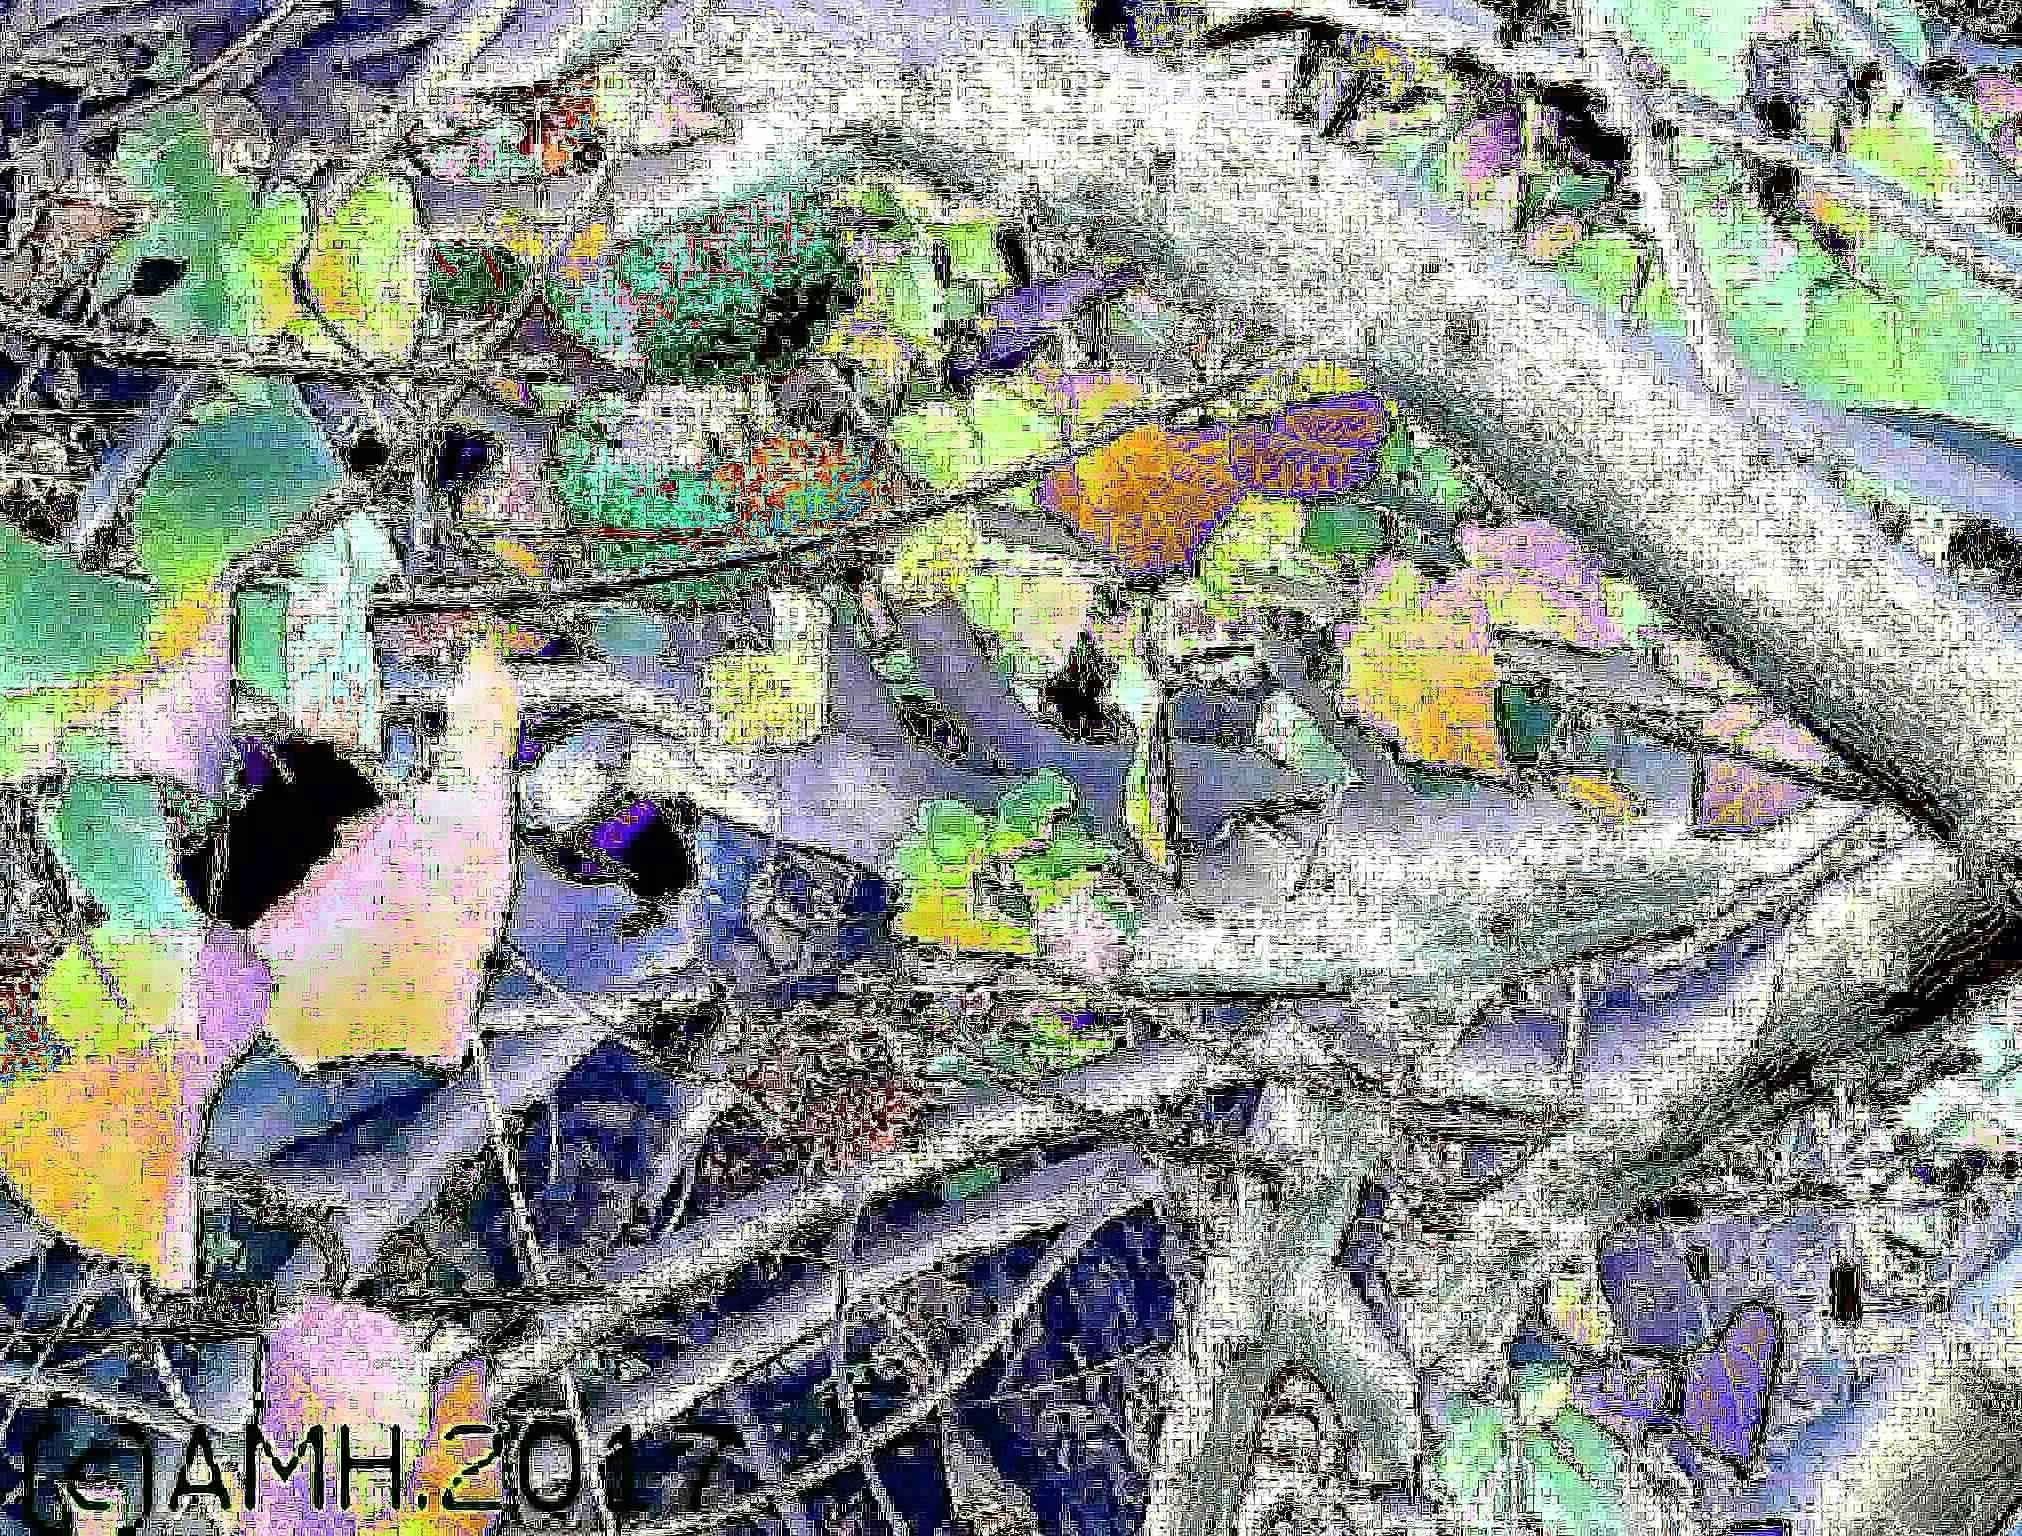 A digital painting from Dompeya tree in Mijas Costa, Spain by ailahokkanen59